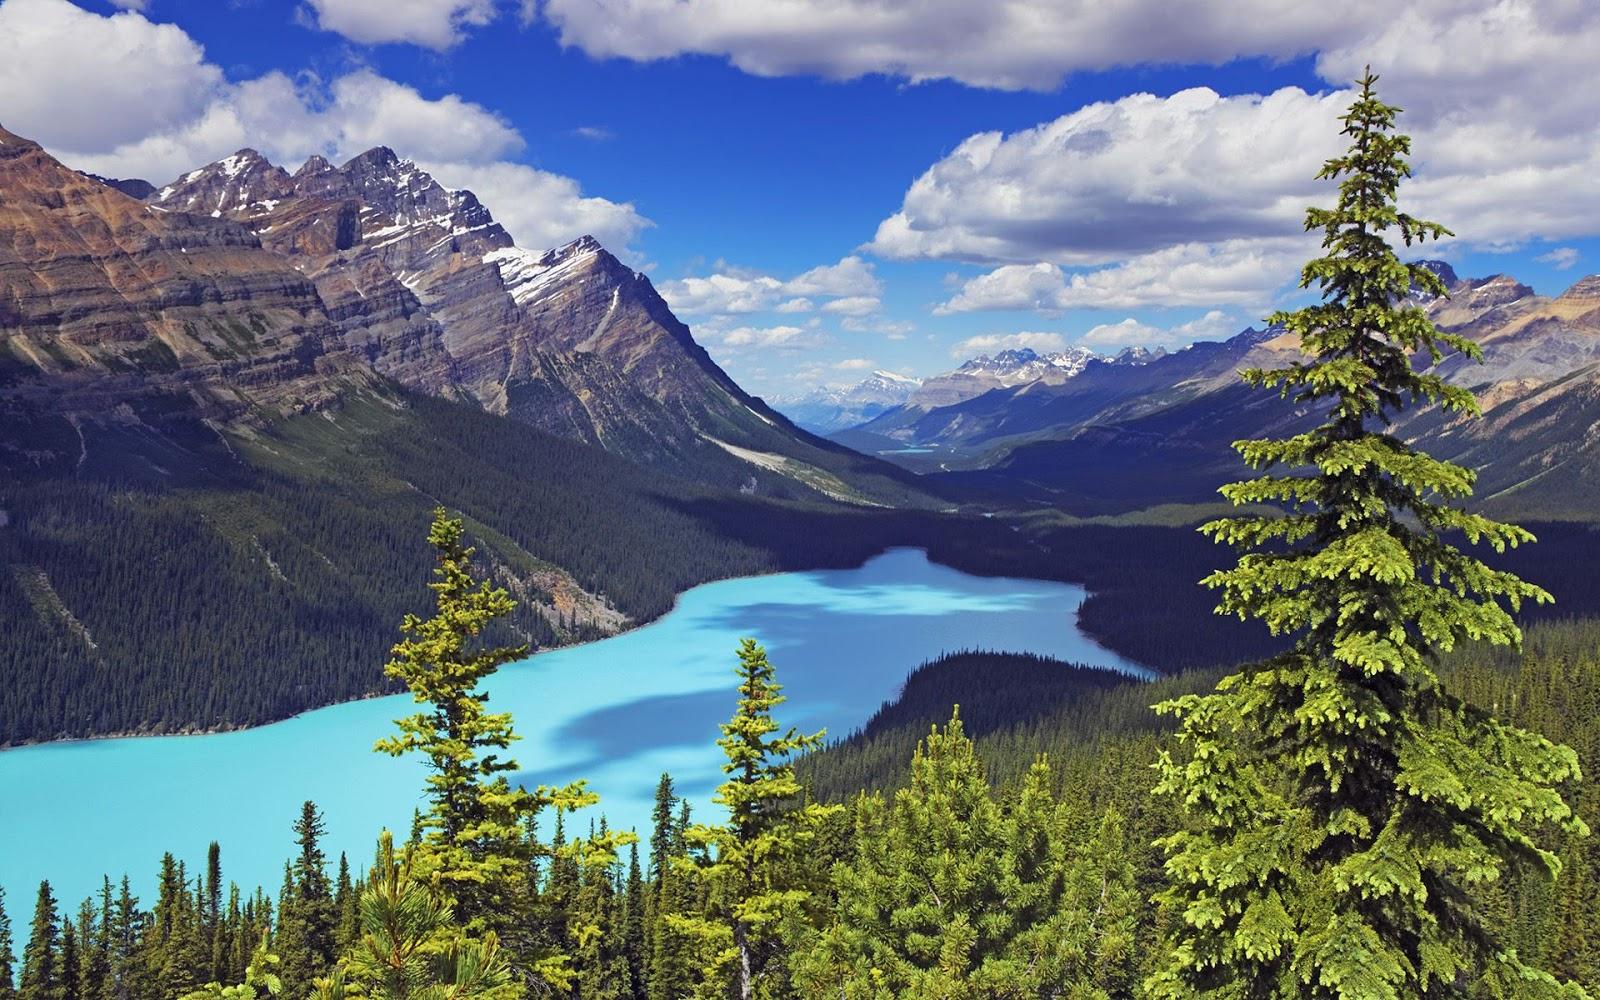 nationalpark alberta kanada - photo #17